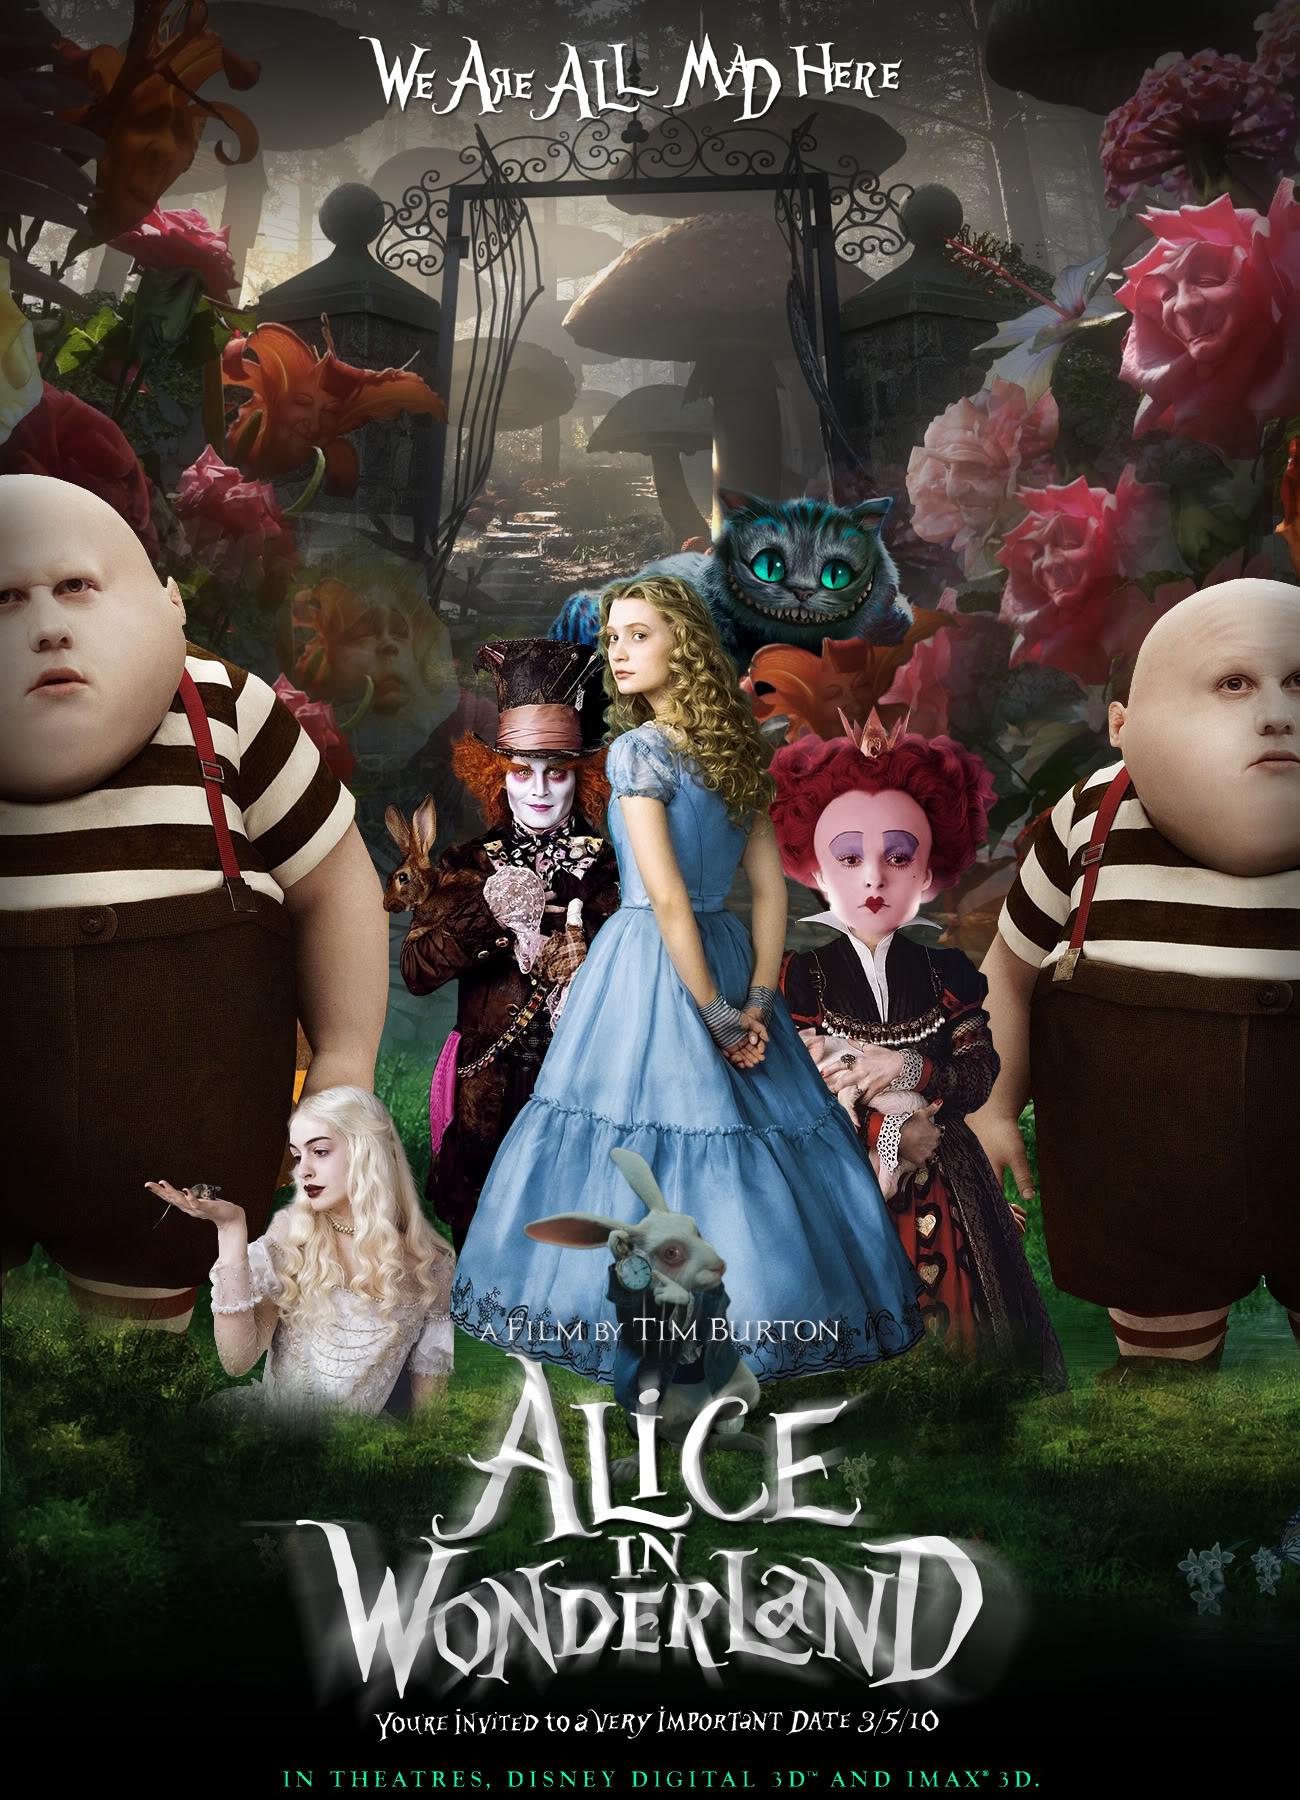 Alice in Wonderland (2010) - Alice in Wonderland Wiki